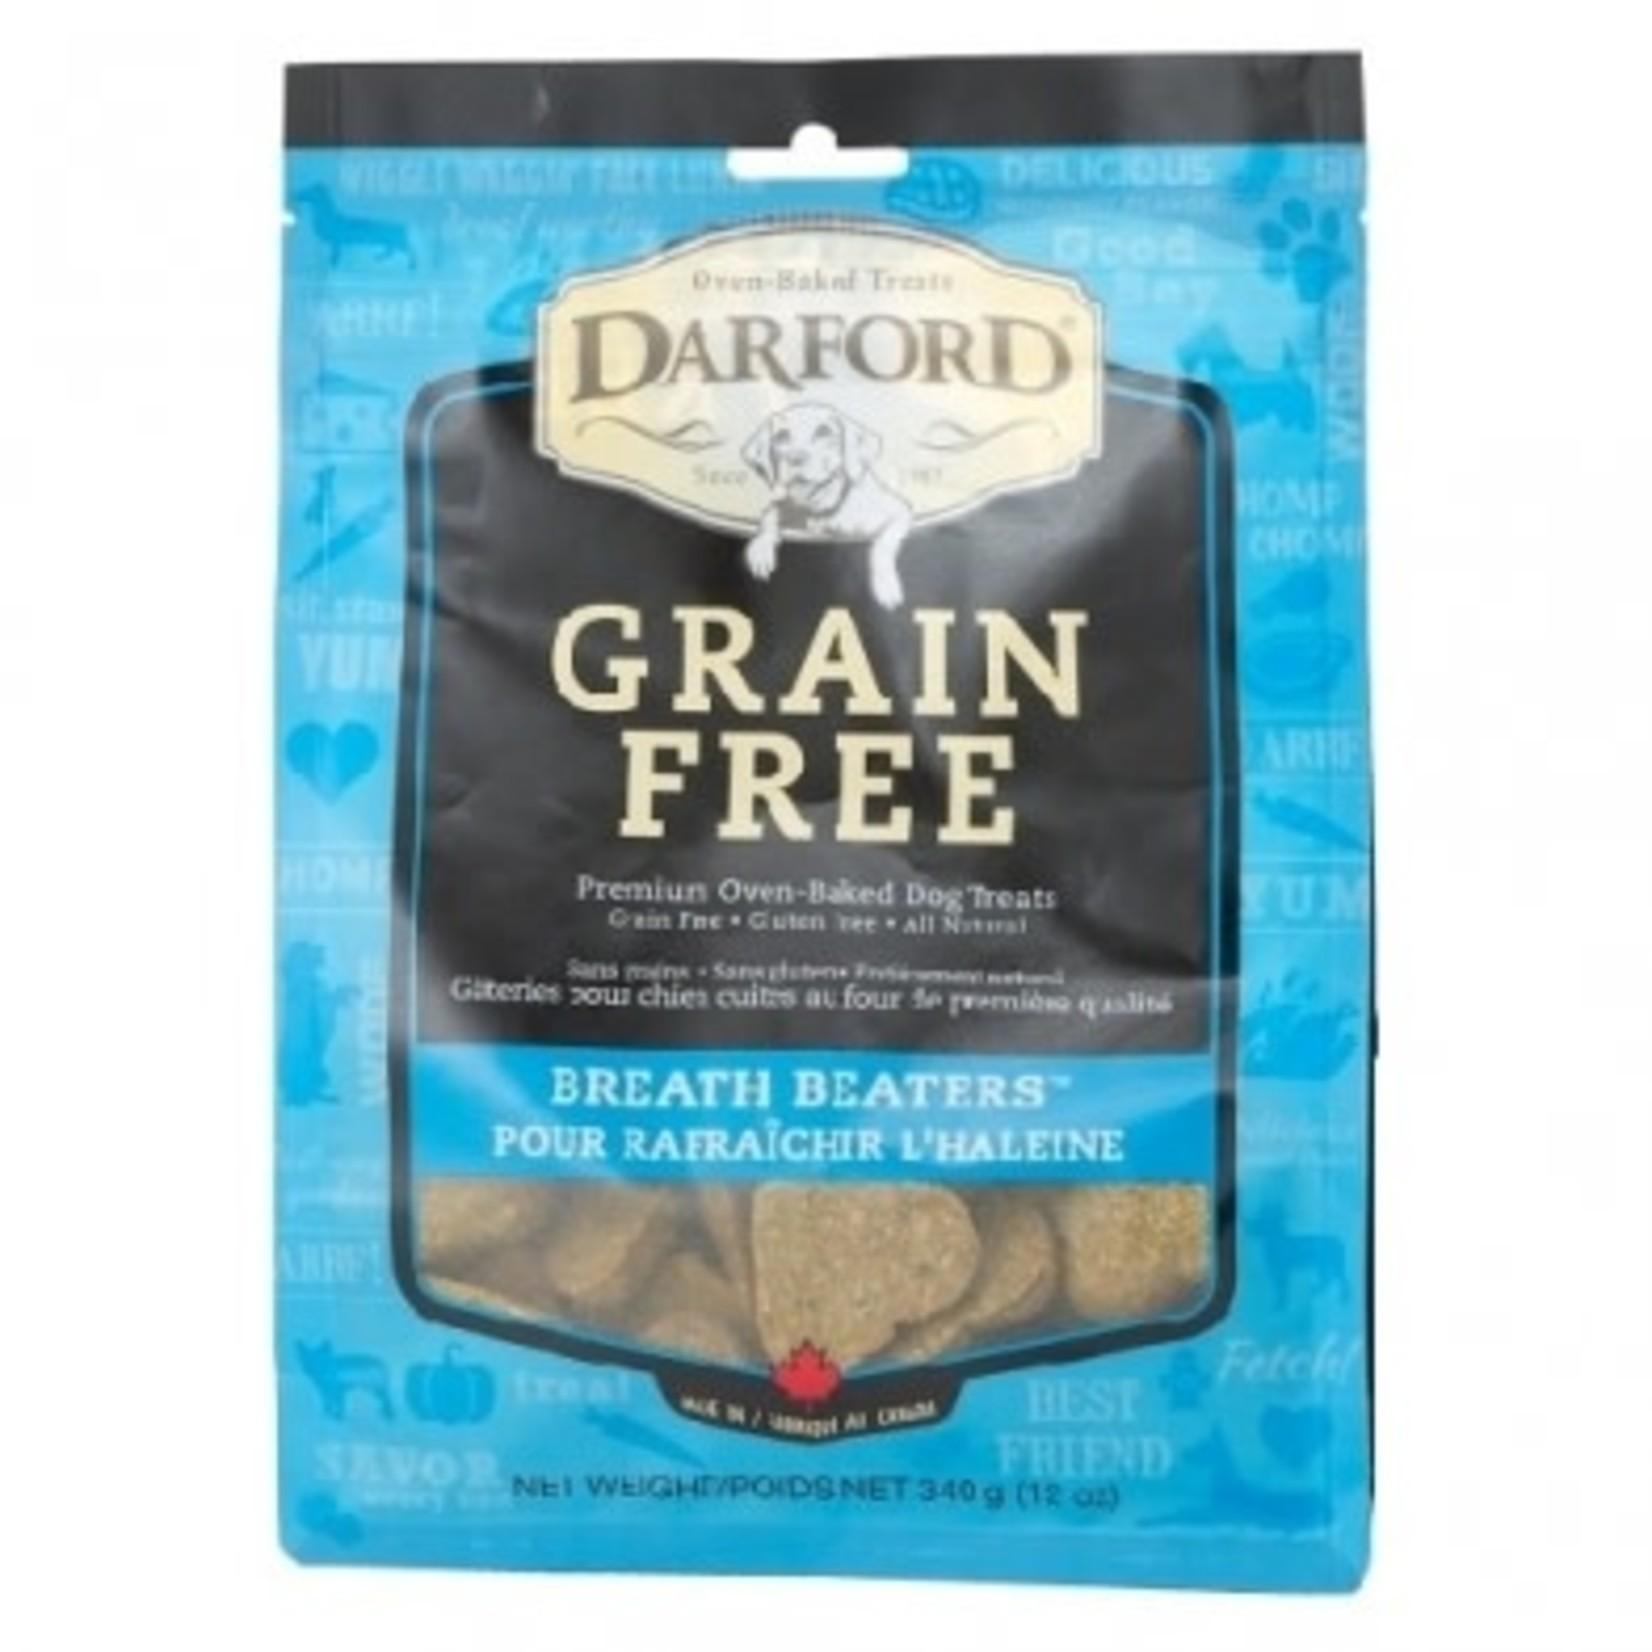 darford Darford grain free Breath Beater 340g/12oz